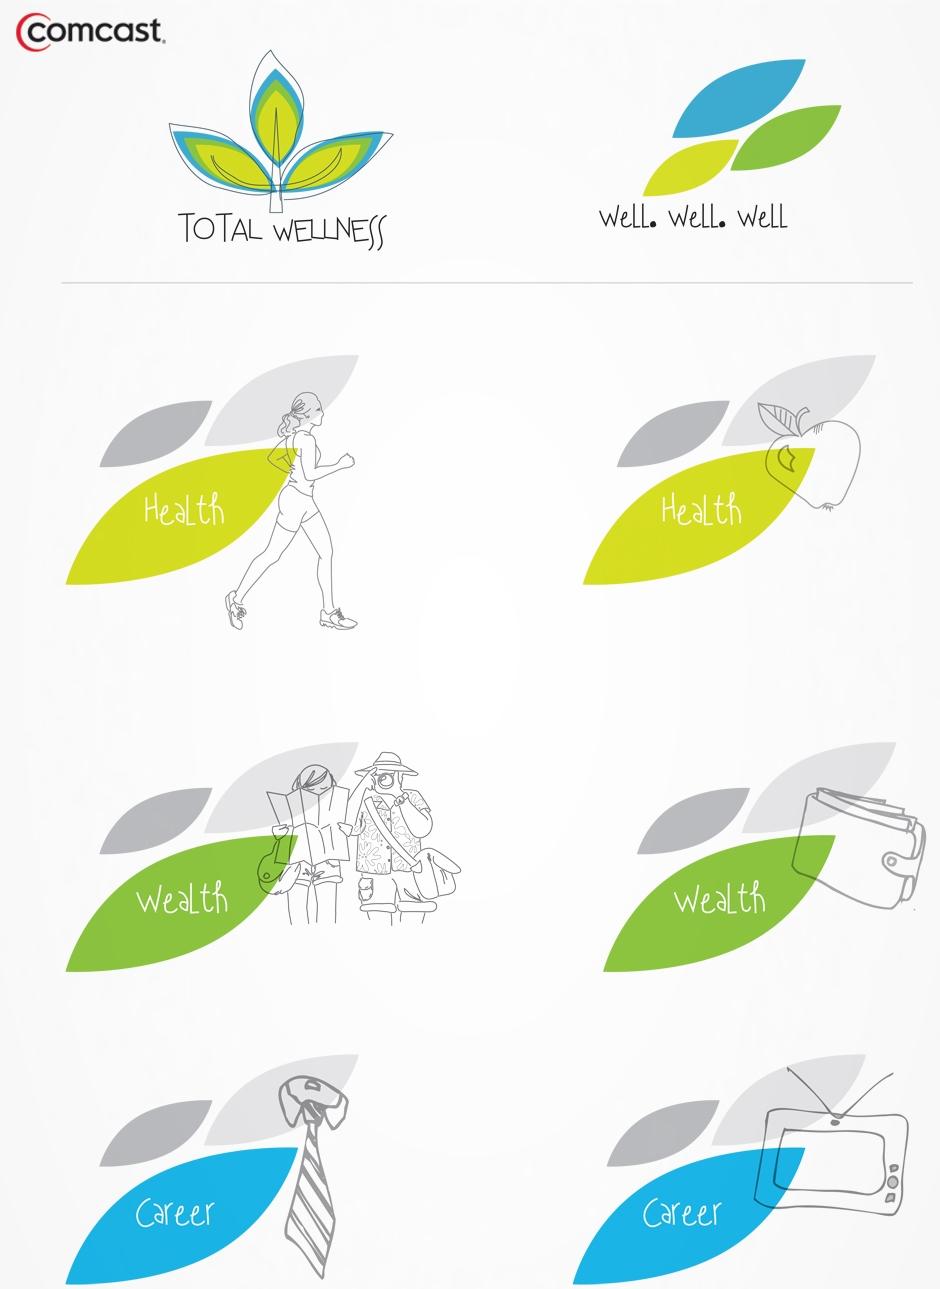 Comcast-total-wellness-health-wealth-career-illustrations  large